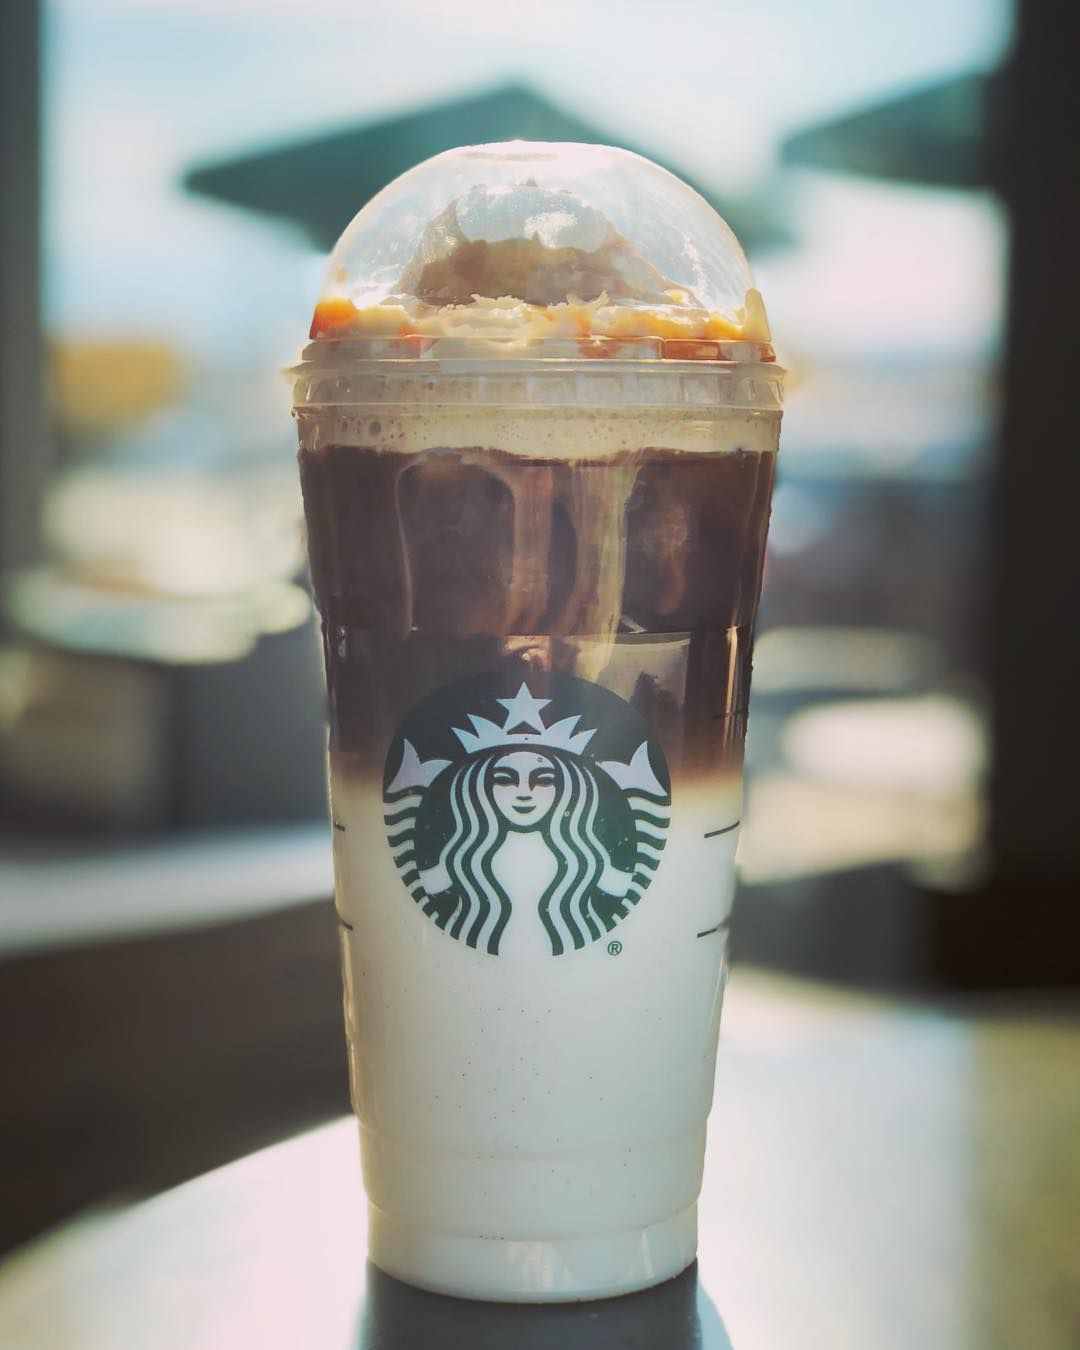 If Only They Had A Size Above Venti Starbucks Coffee Caramelmacchiato Caramel Macchiato Irish Coffee Coffee Lover